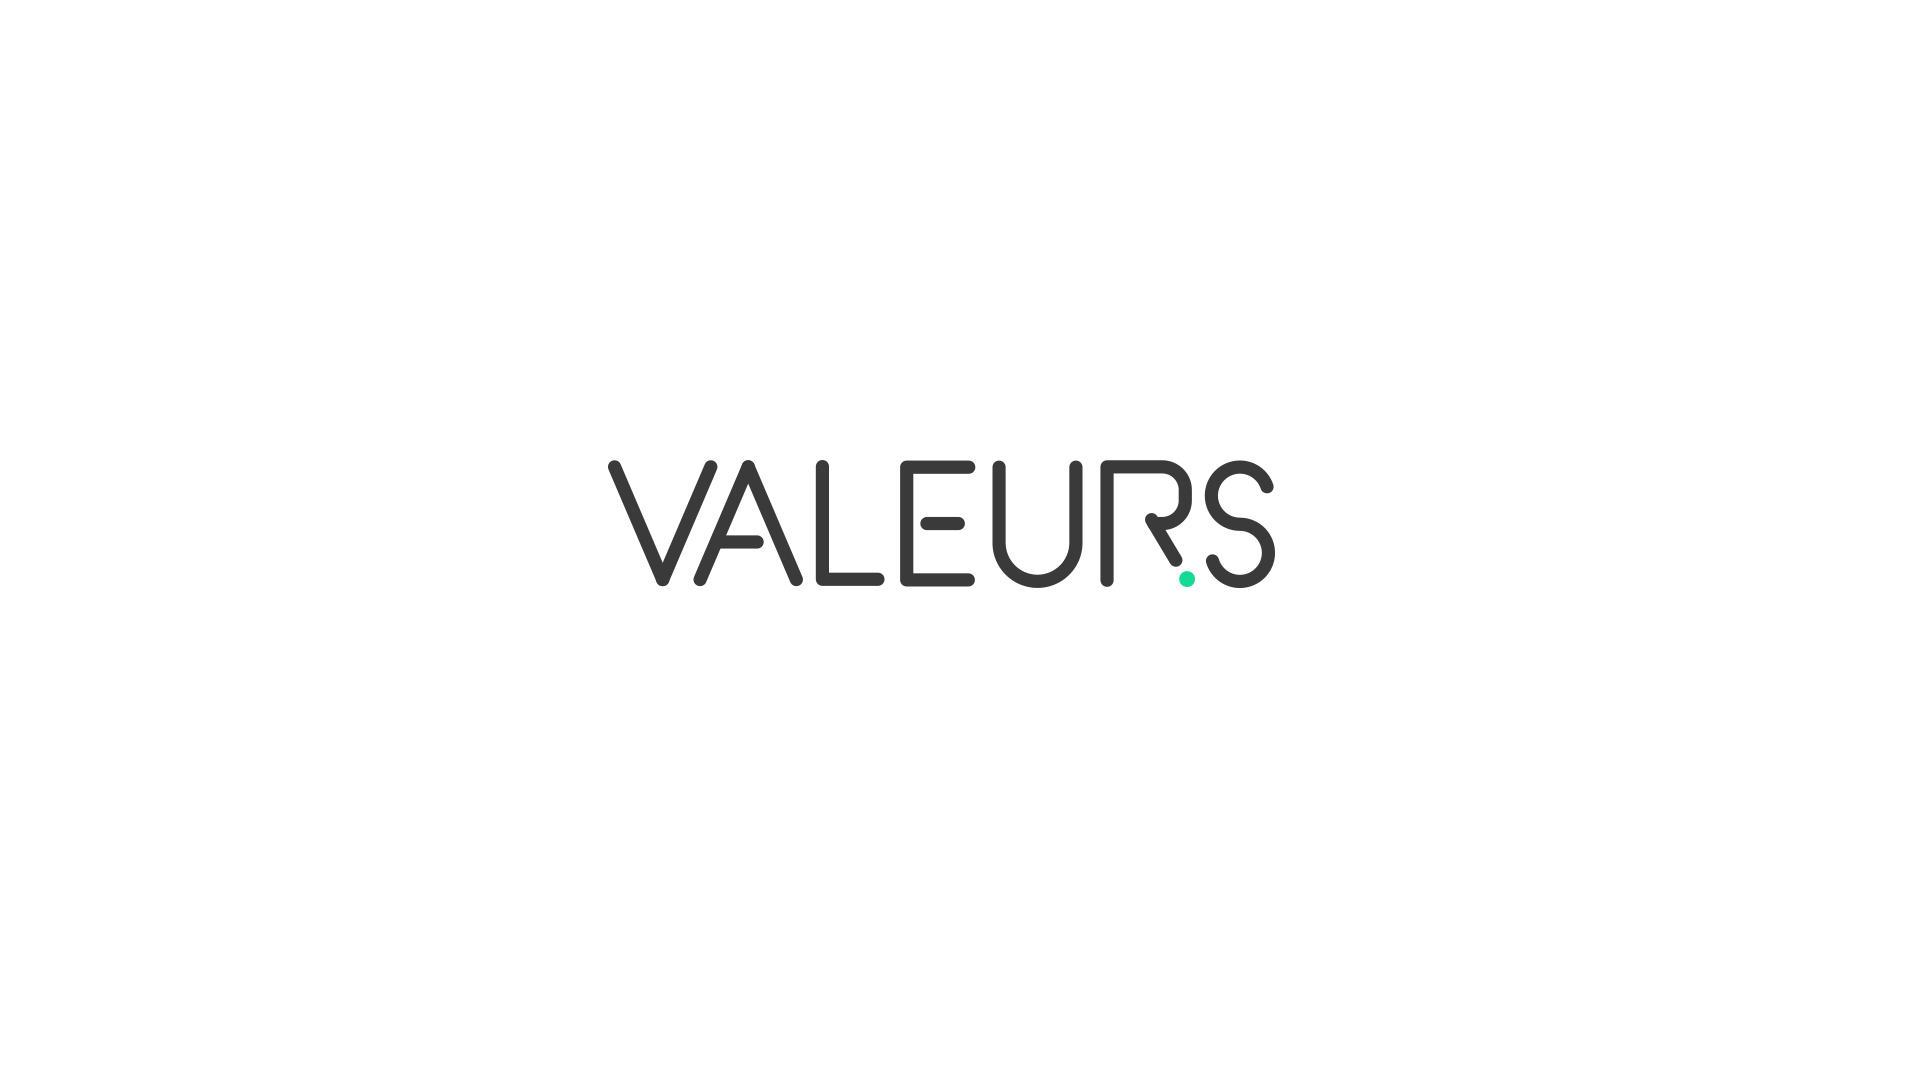 LesTontonsMakers-Valeurs-typo